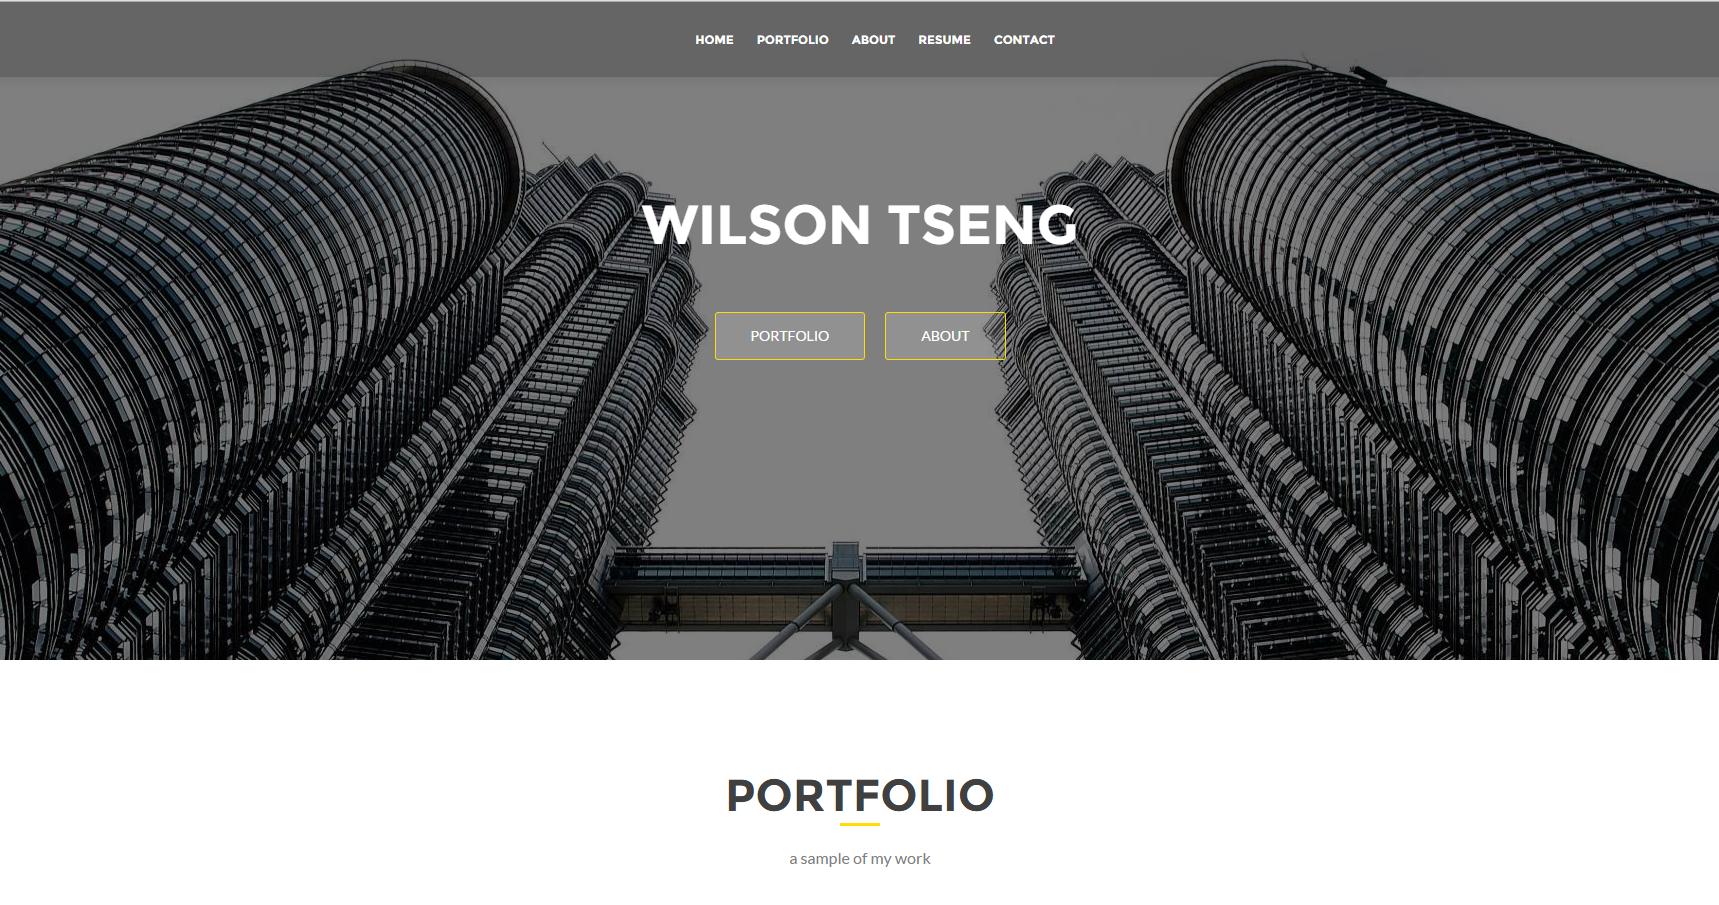 WilsonTseng.com